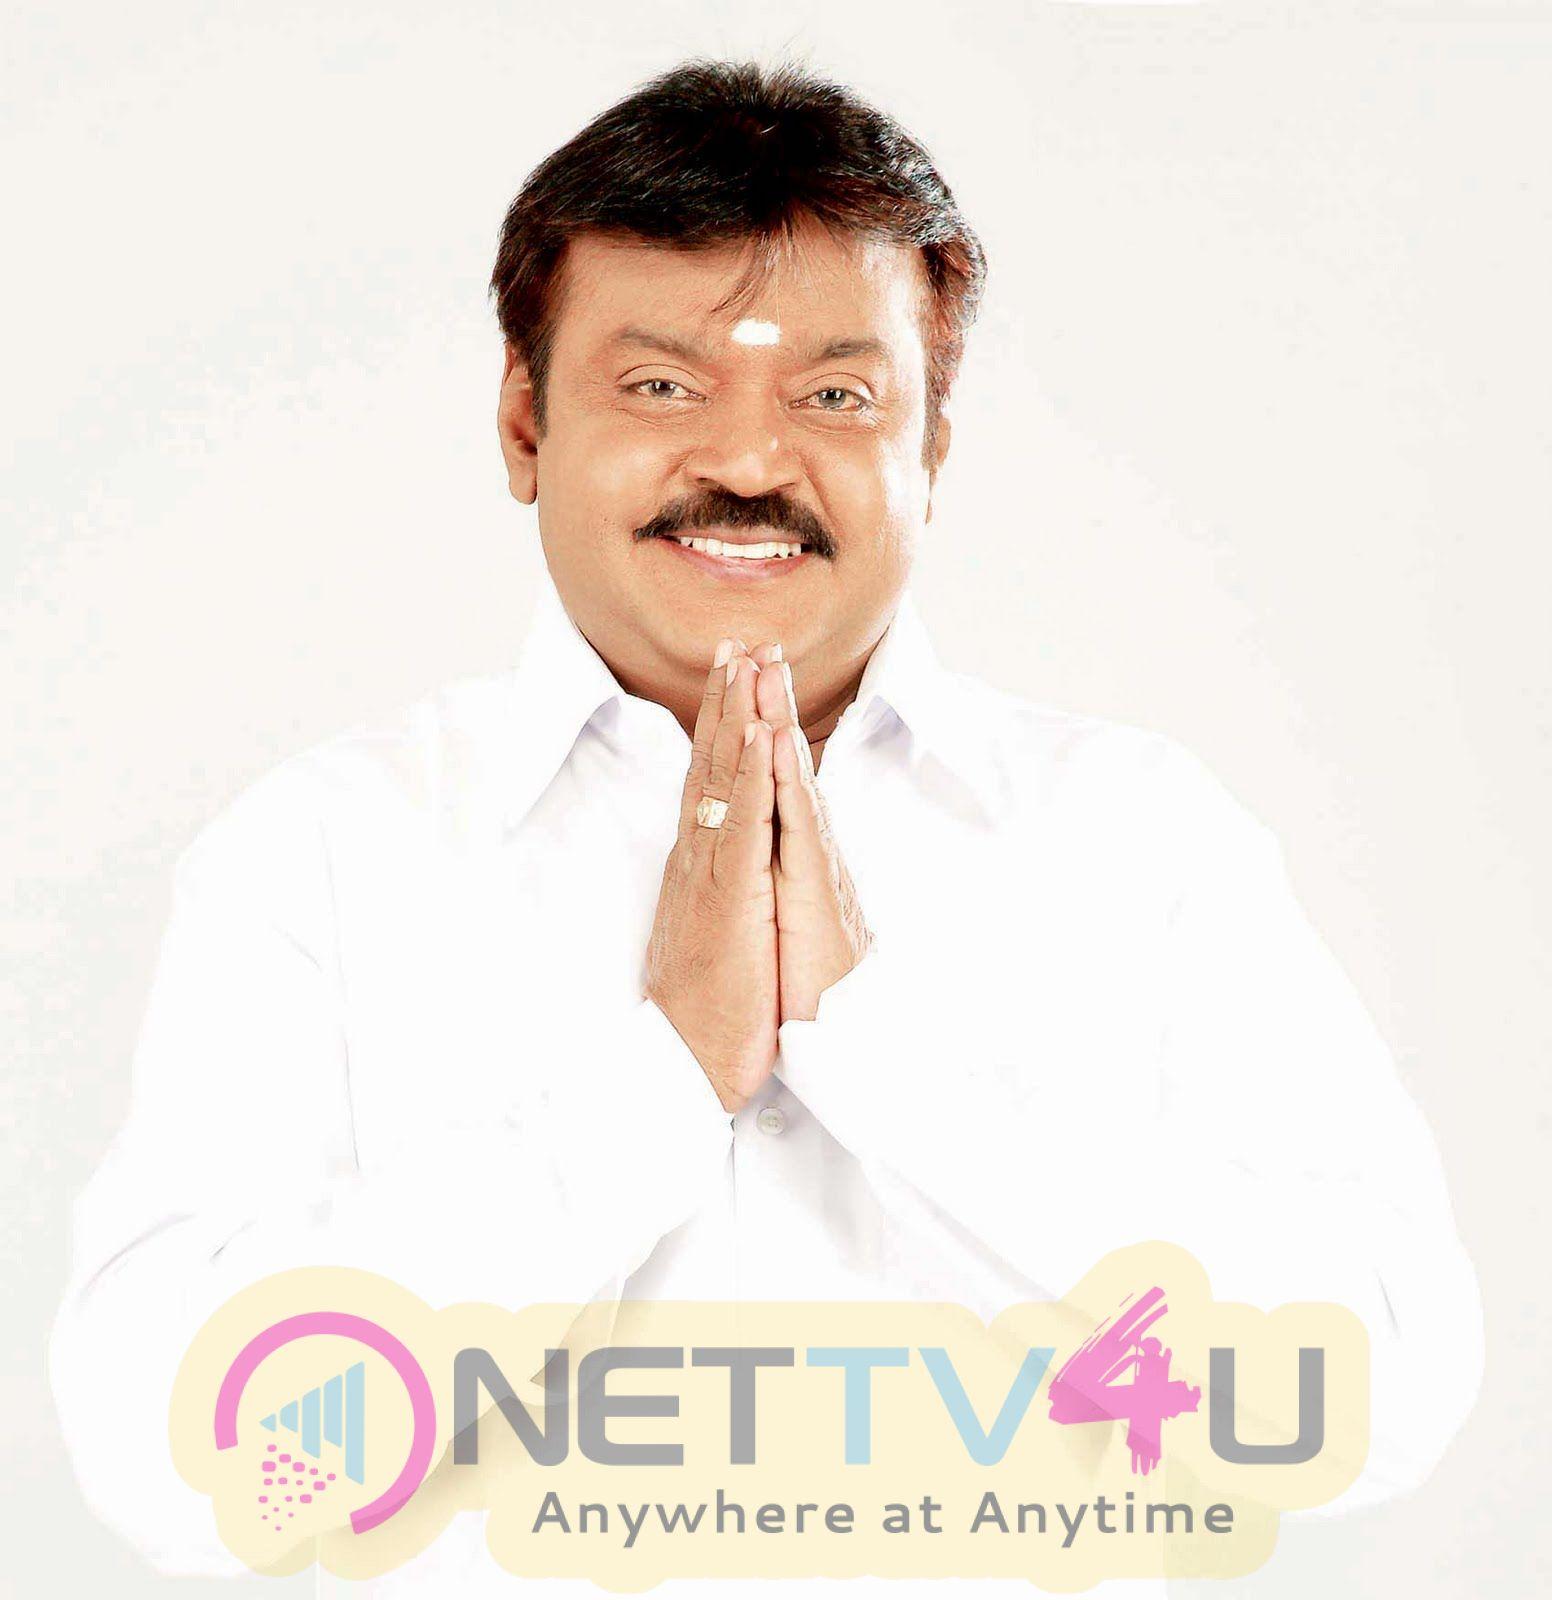 Actor Vijayakanth Good Looking Images